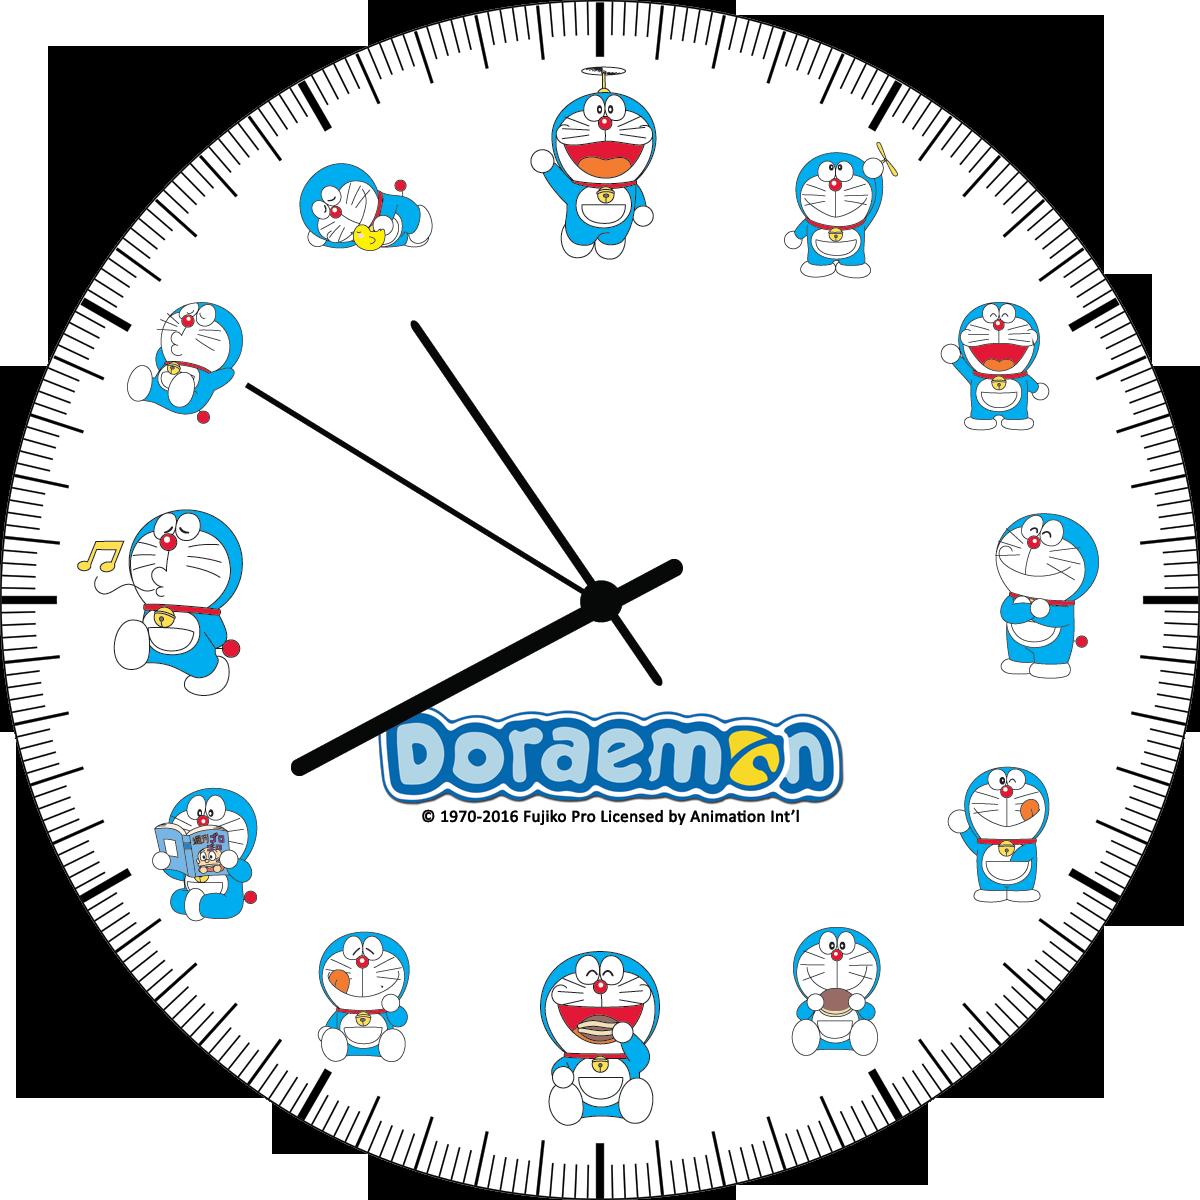 Doraemon Art-Print-Materia Saat Watch Design